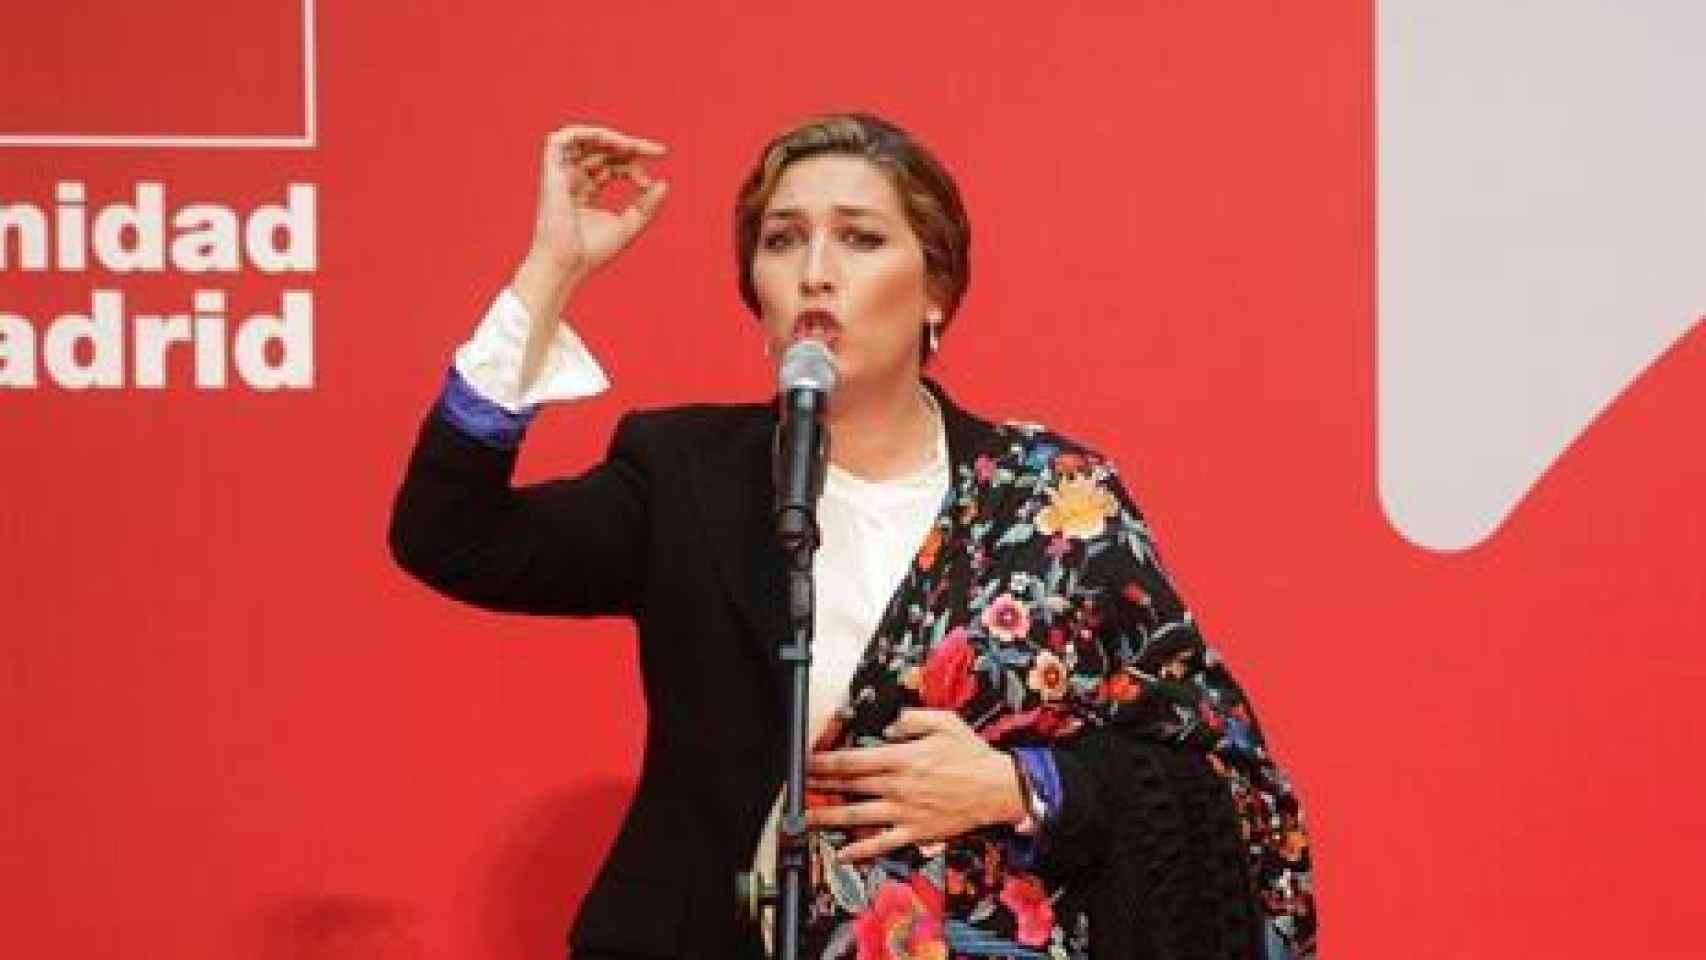 Estrella Morente: Estamos hartos de que en España no haya diálogo